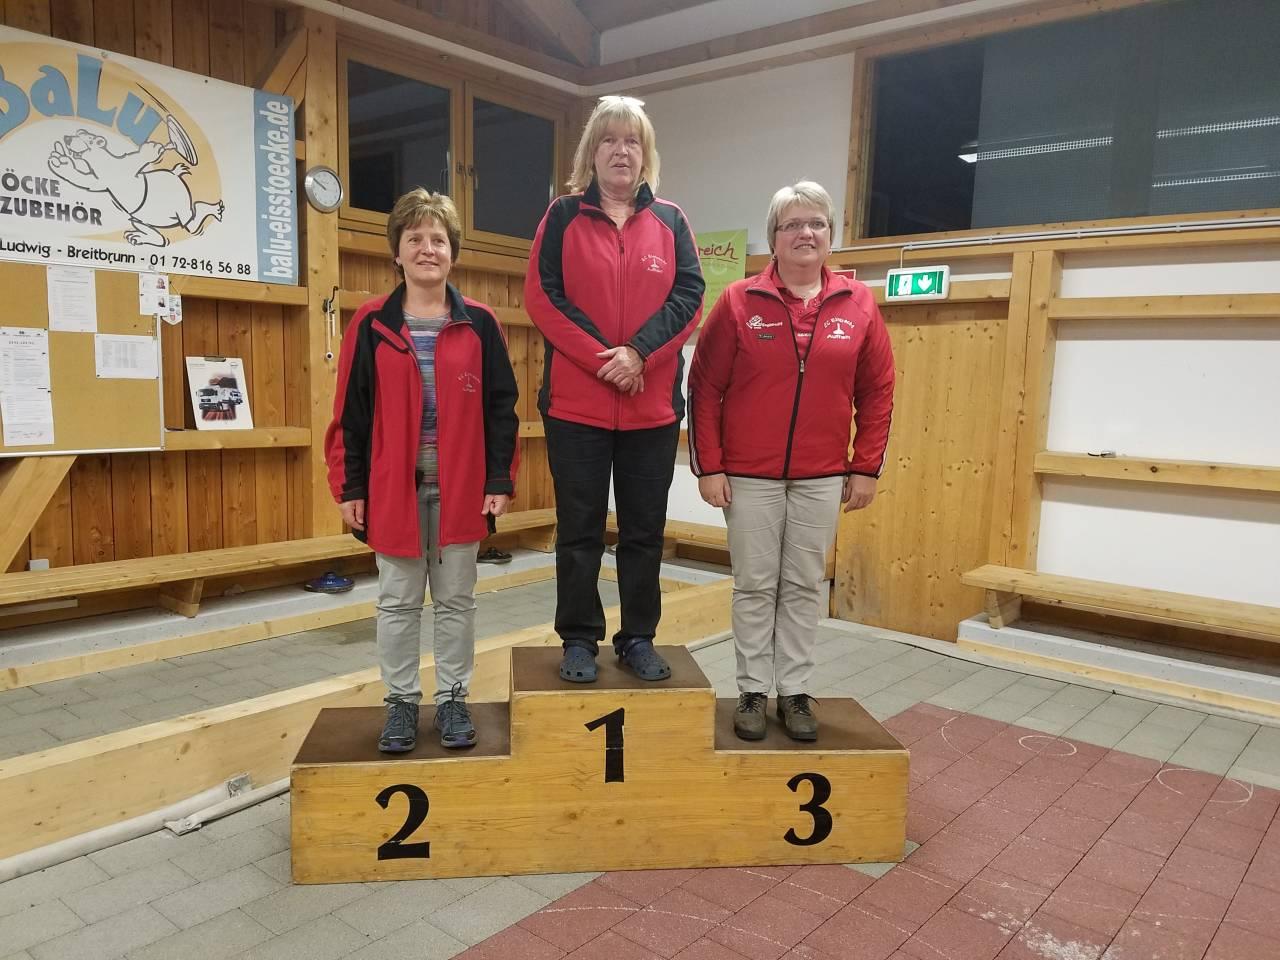 v.l. 2. Evi Stumpfegger (219) - 1. Maria Sappel (222) - 3. Gerti Hogger (215)